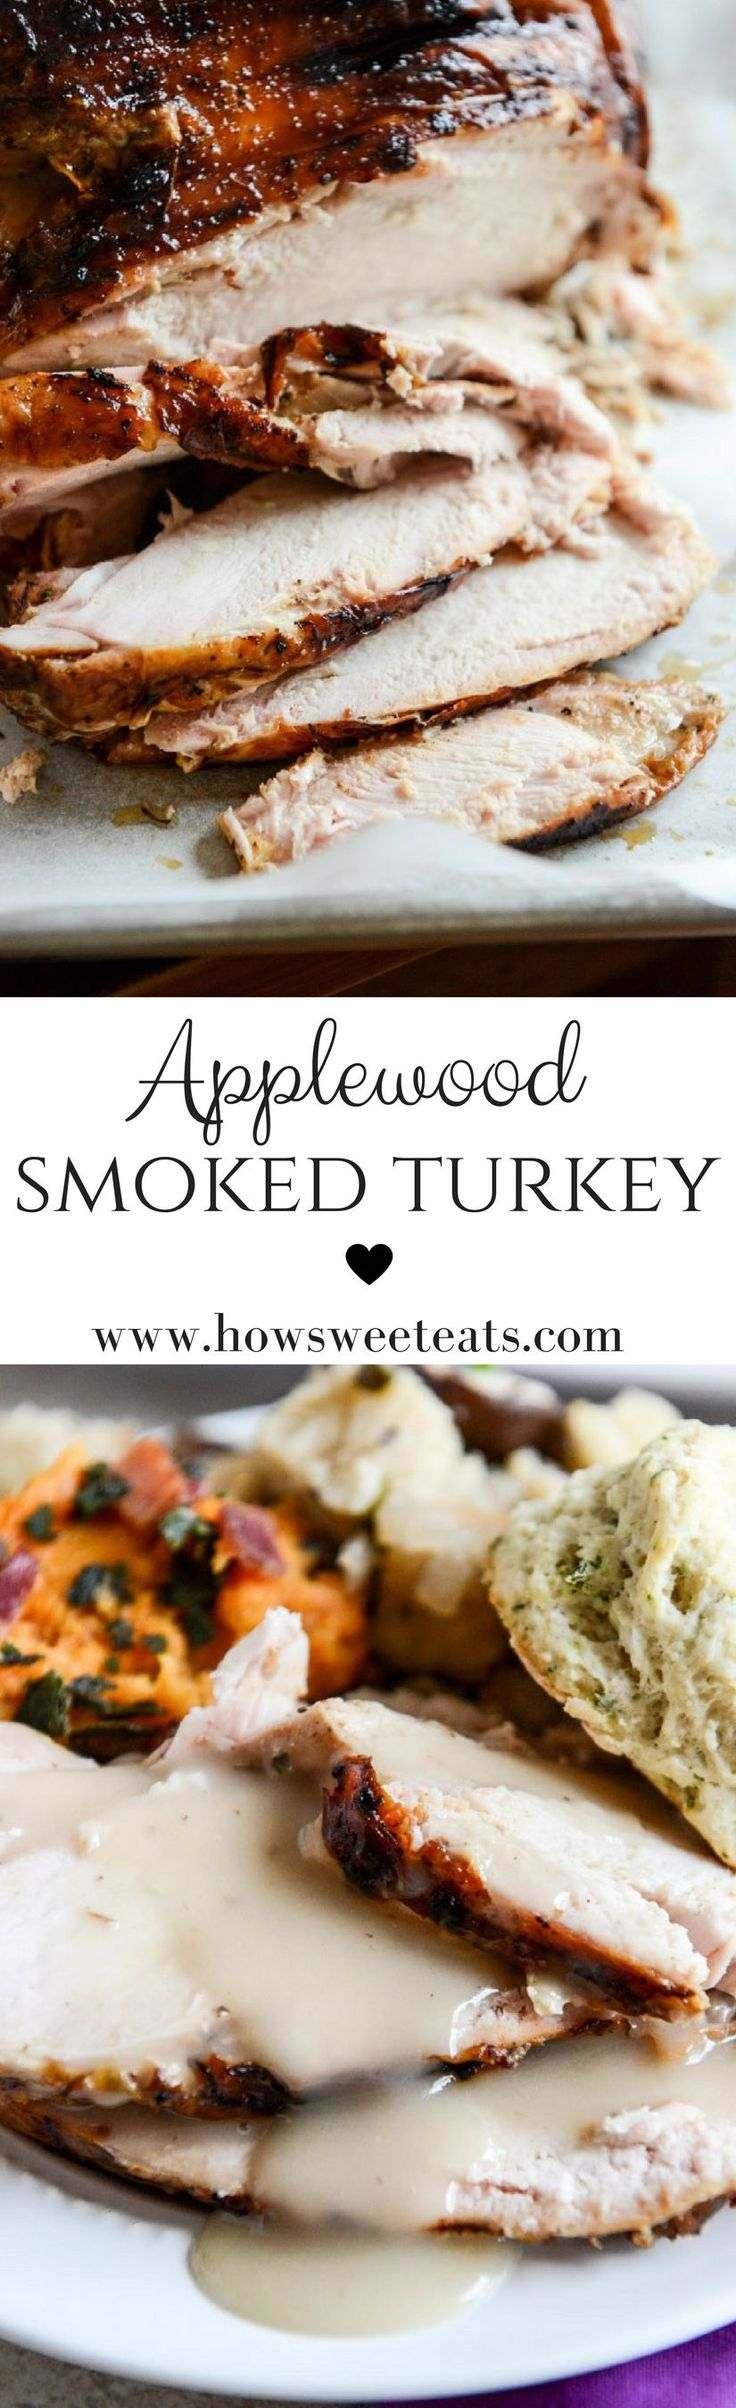 Applewood Smoked Turkey with Cider Bourbon Gravy I howsweeteats.com @howsweeteats